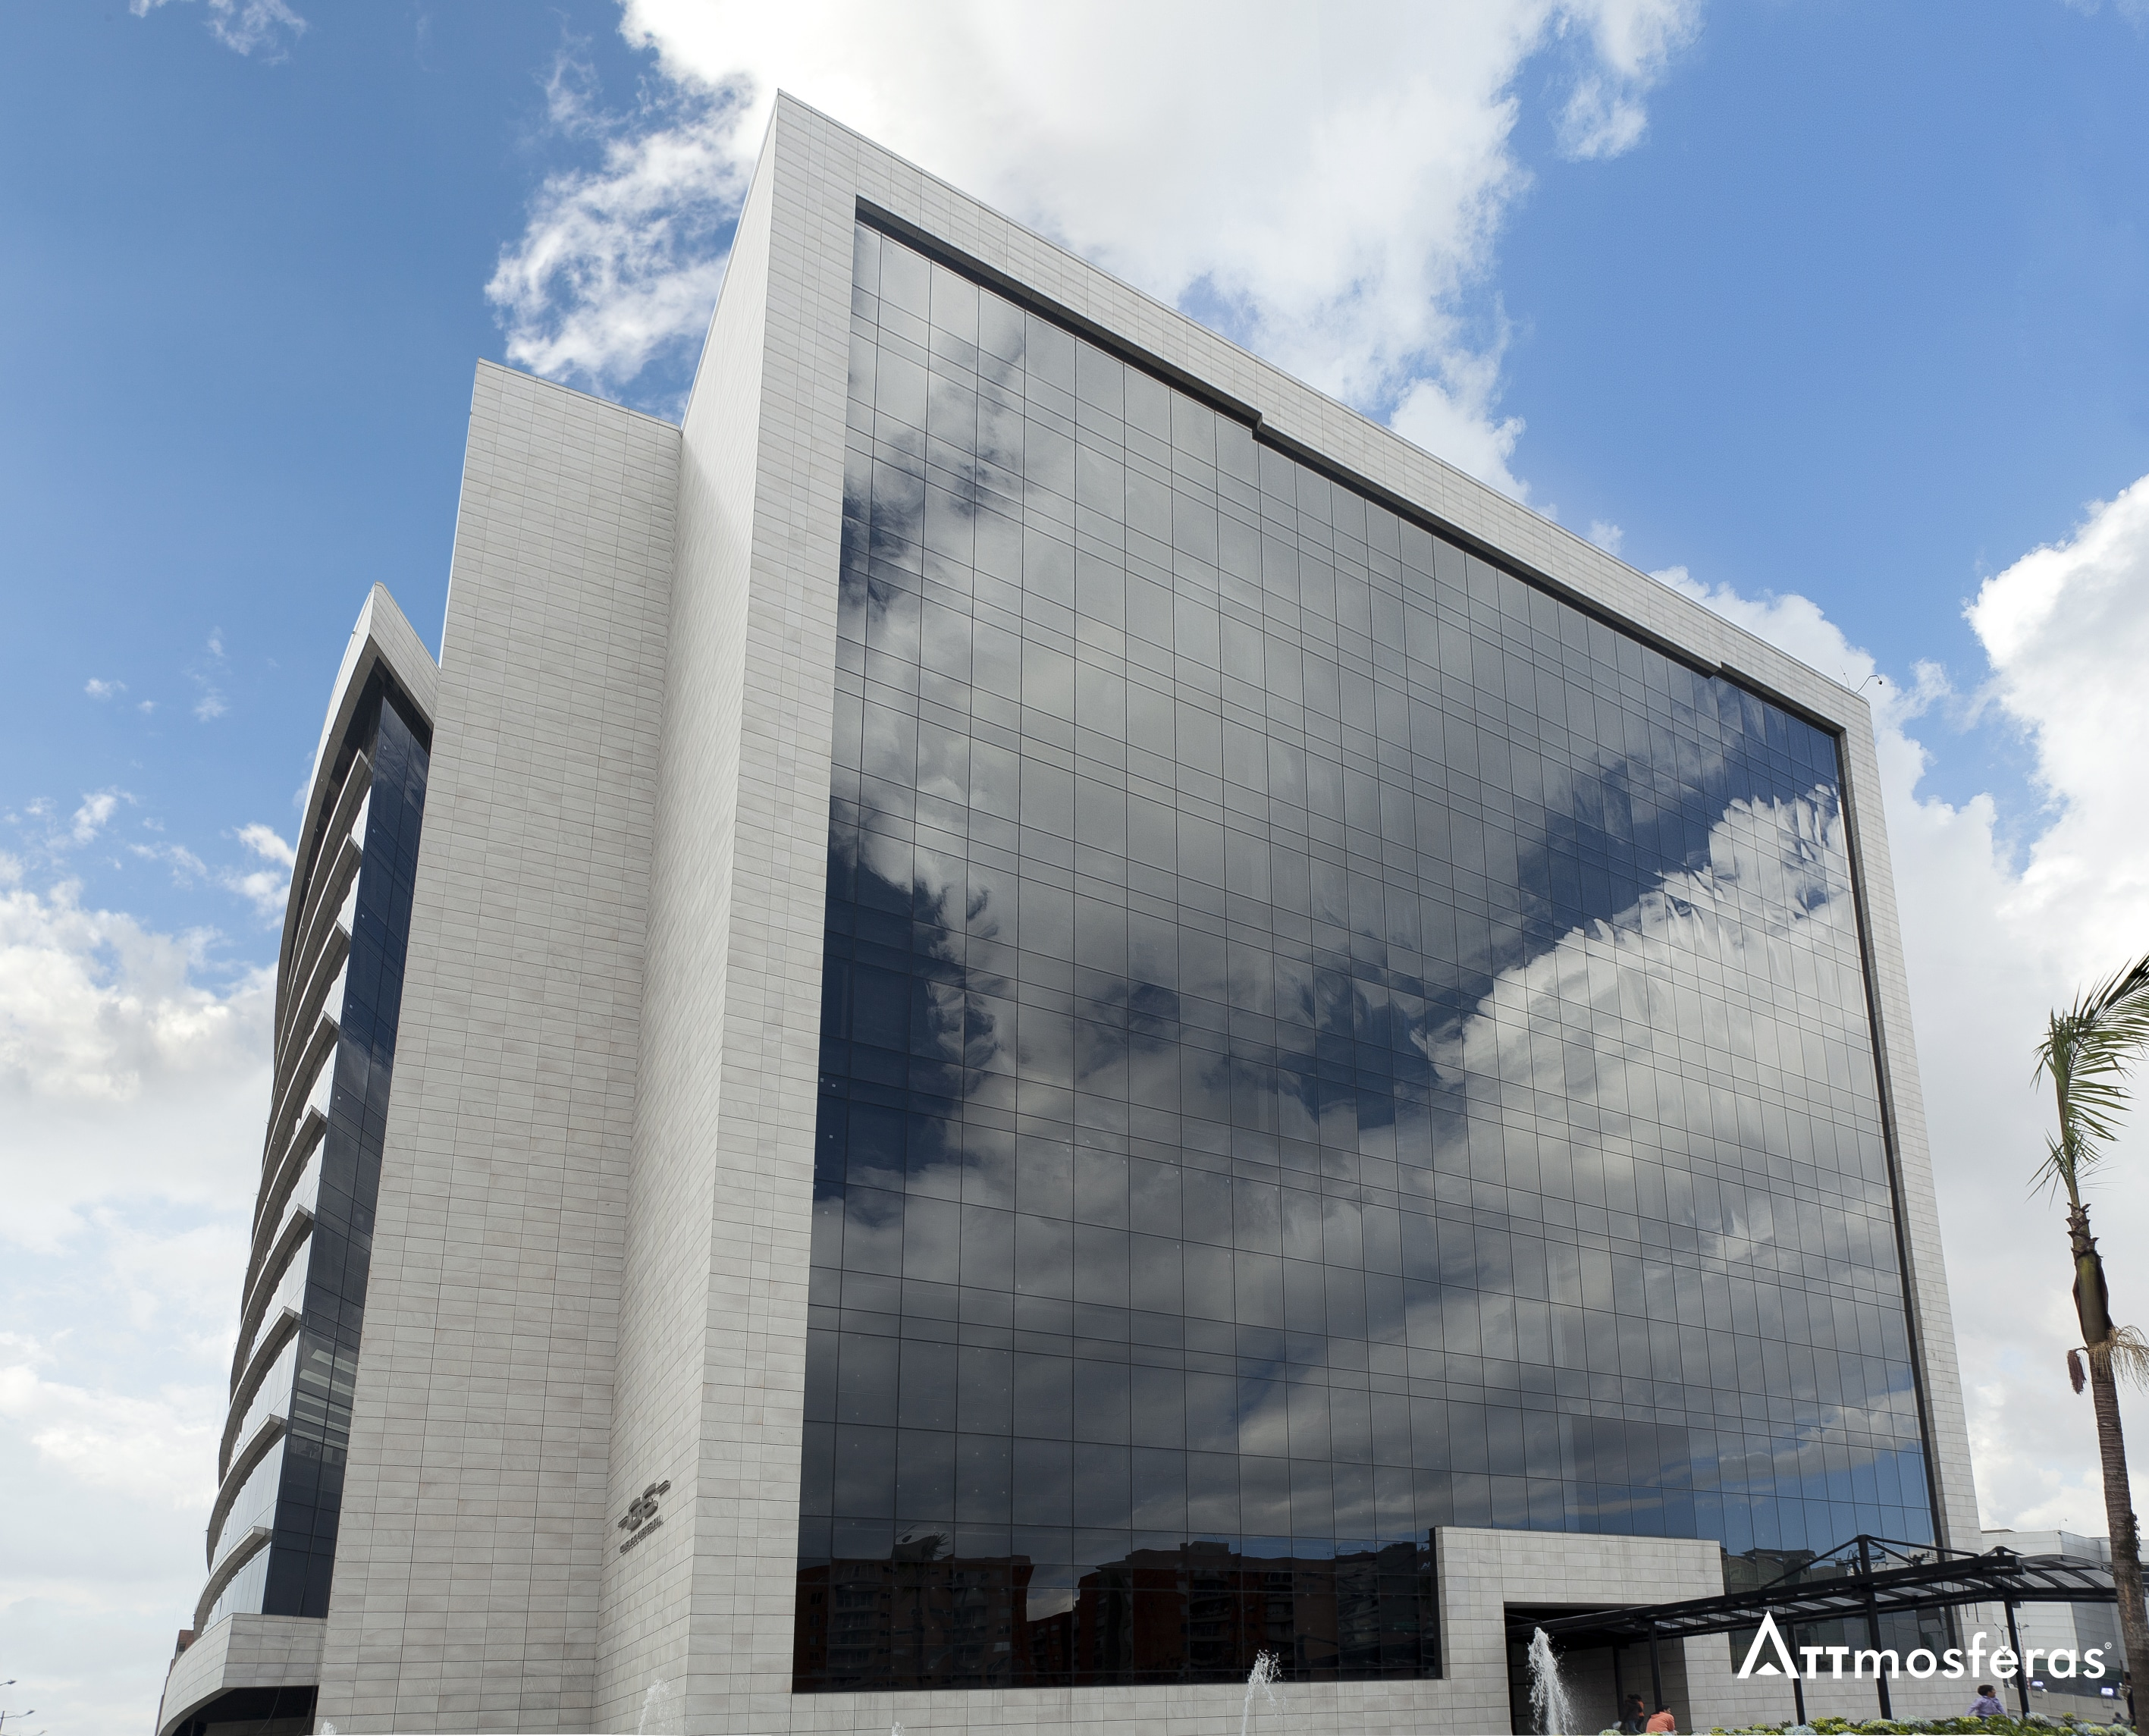 fachada ventilada attmosferas